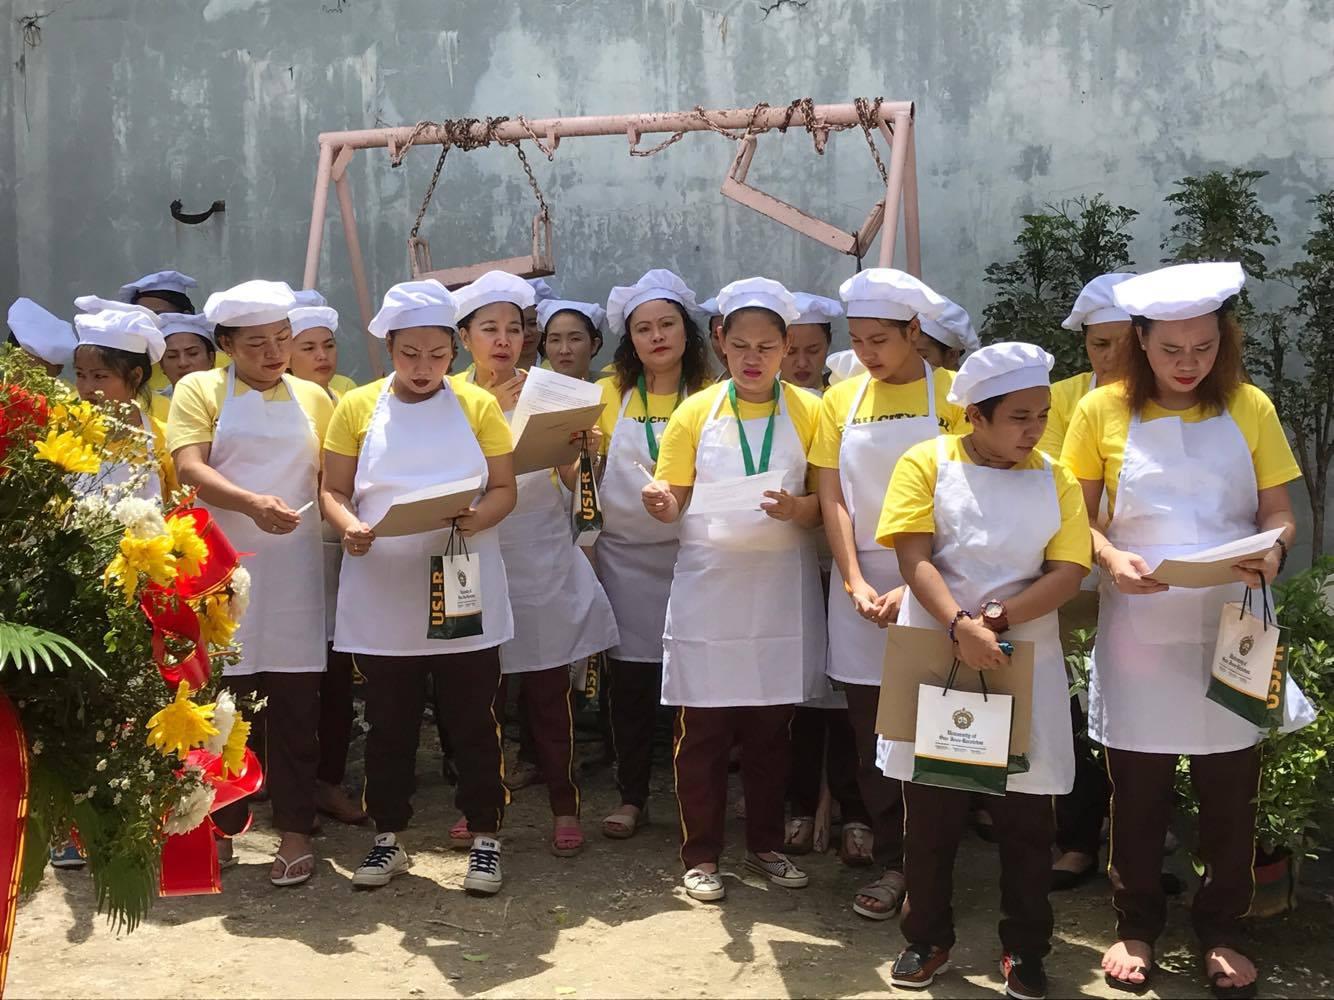 Filipinas-Horno-Carcel-Mujeres-2